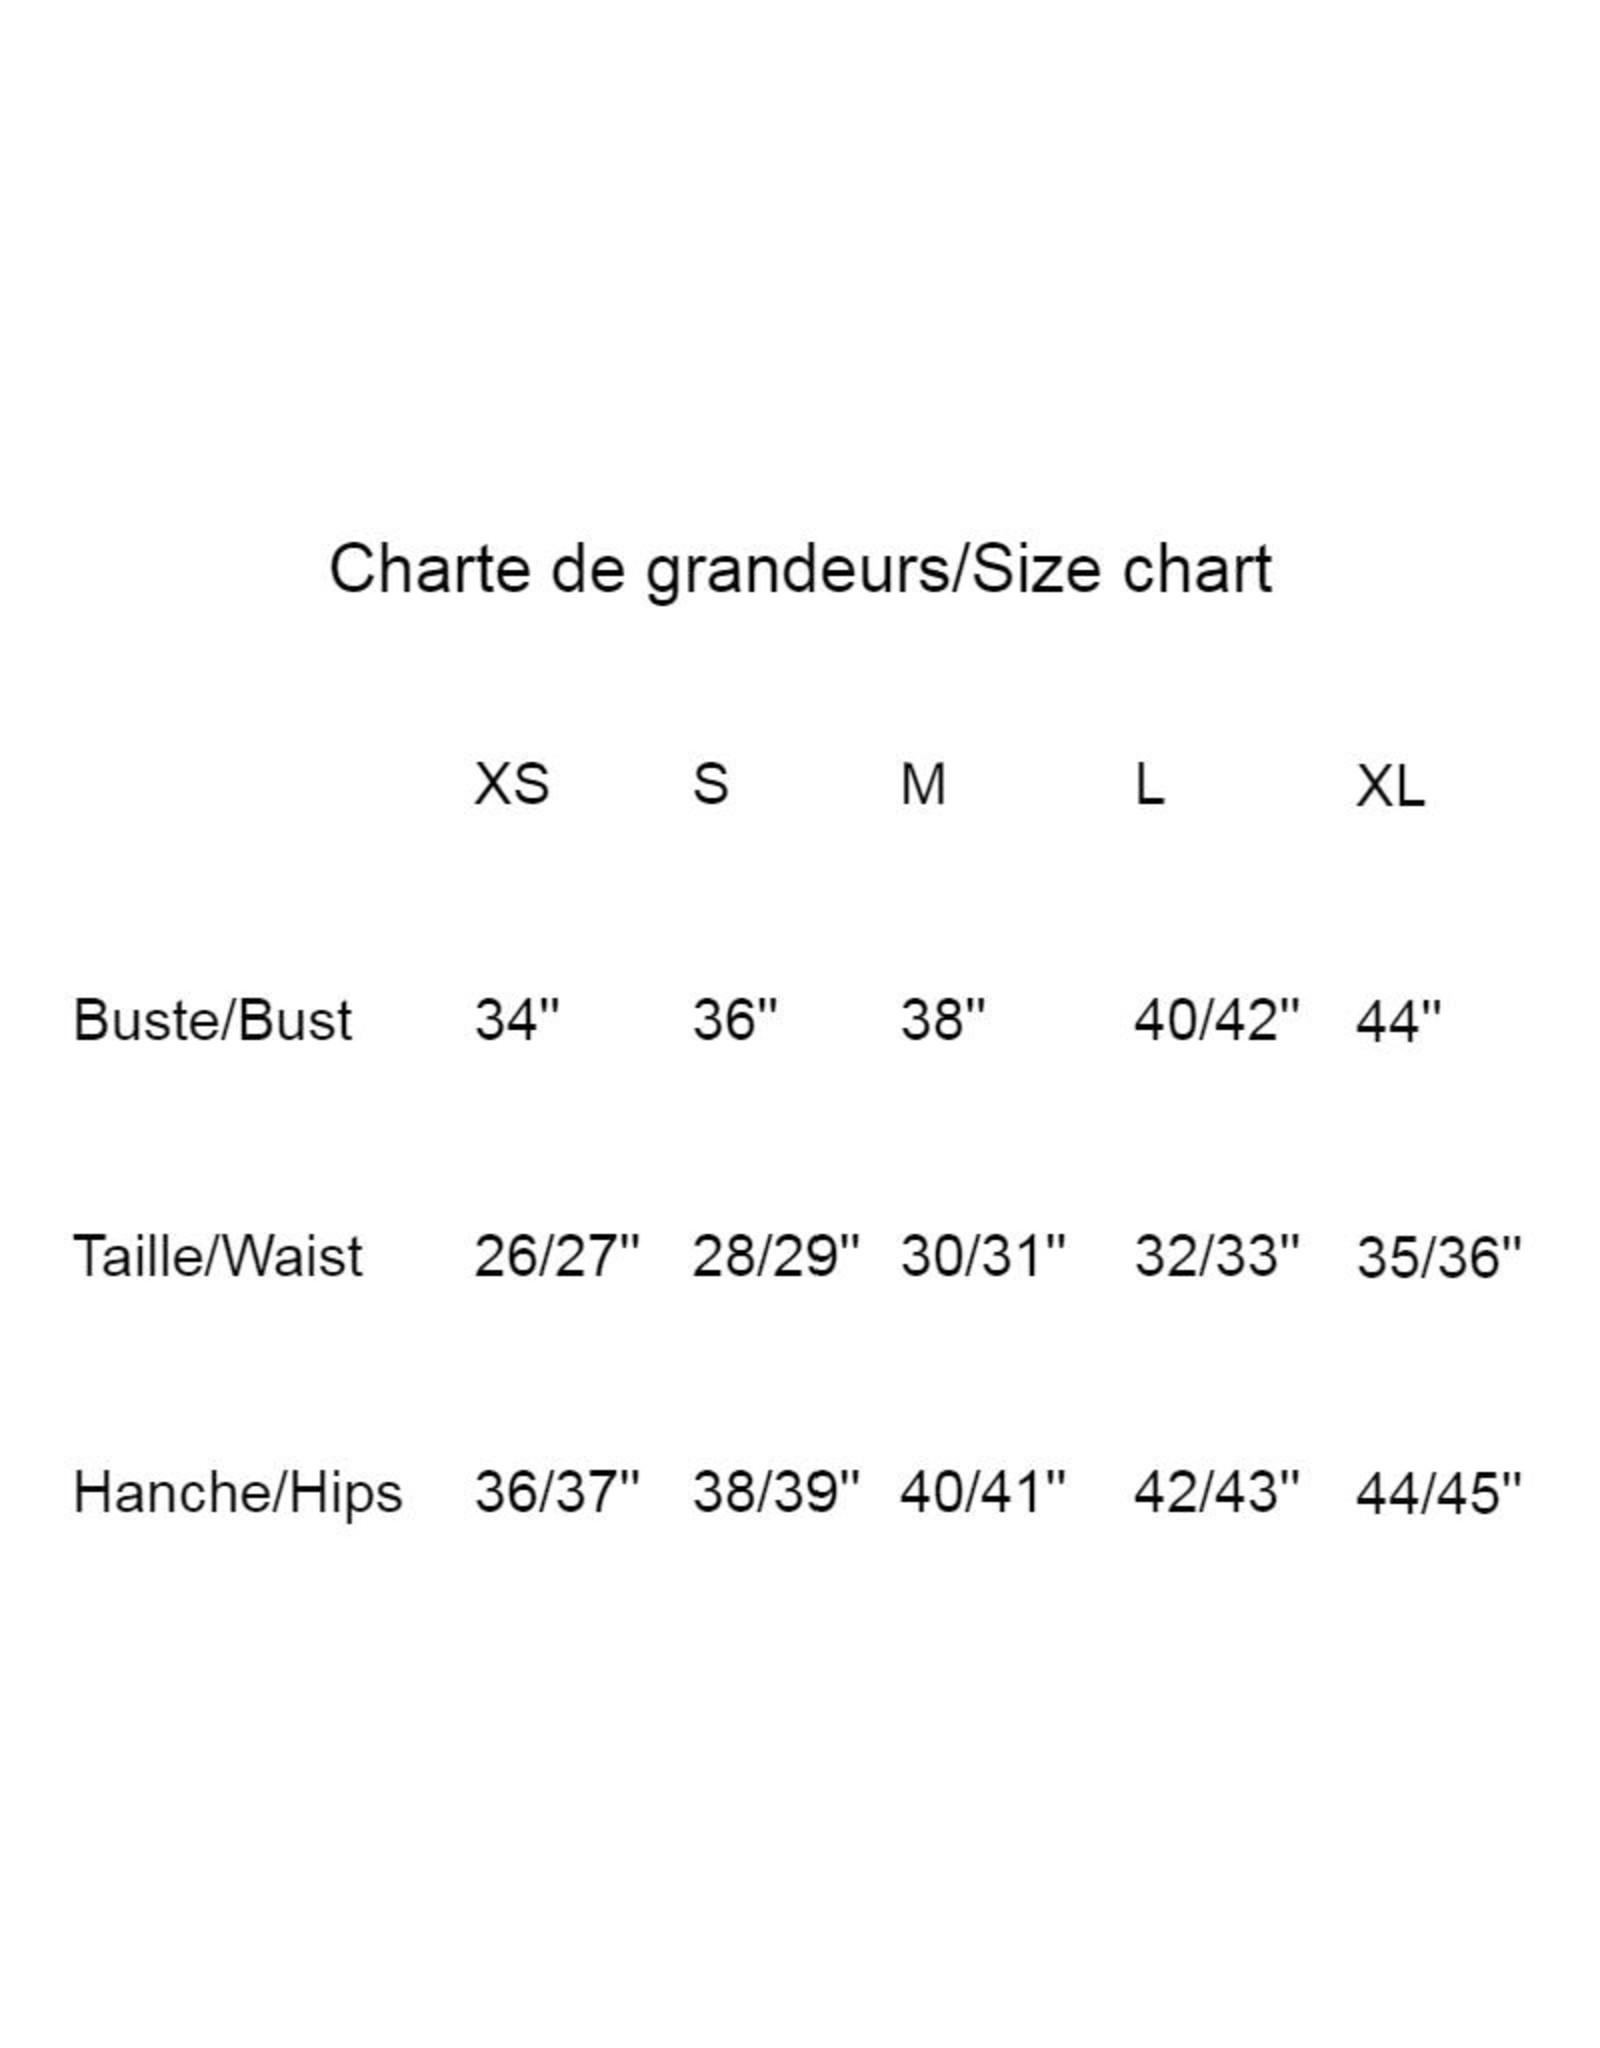 Les Coureurs de Jupons Chandail El Classico 3/4 Bambou AH1819 Les Coureurs de Jupons Crème